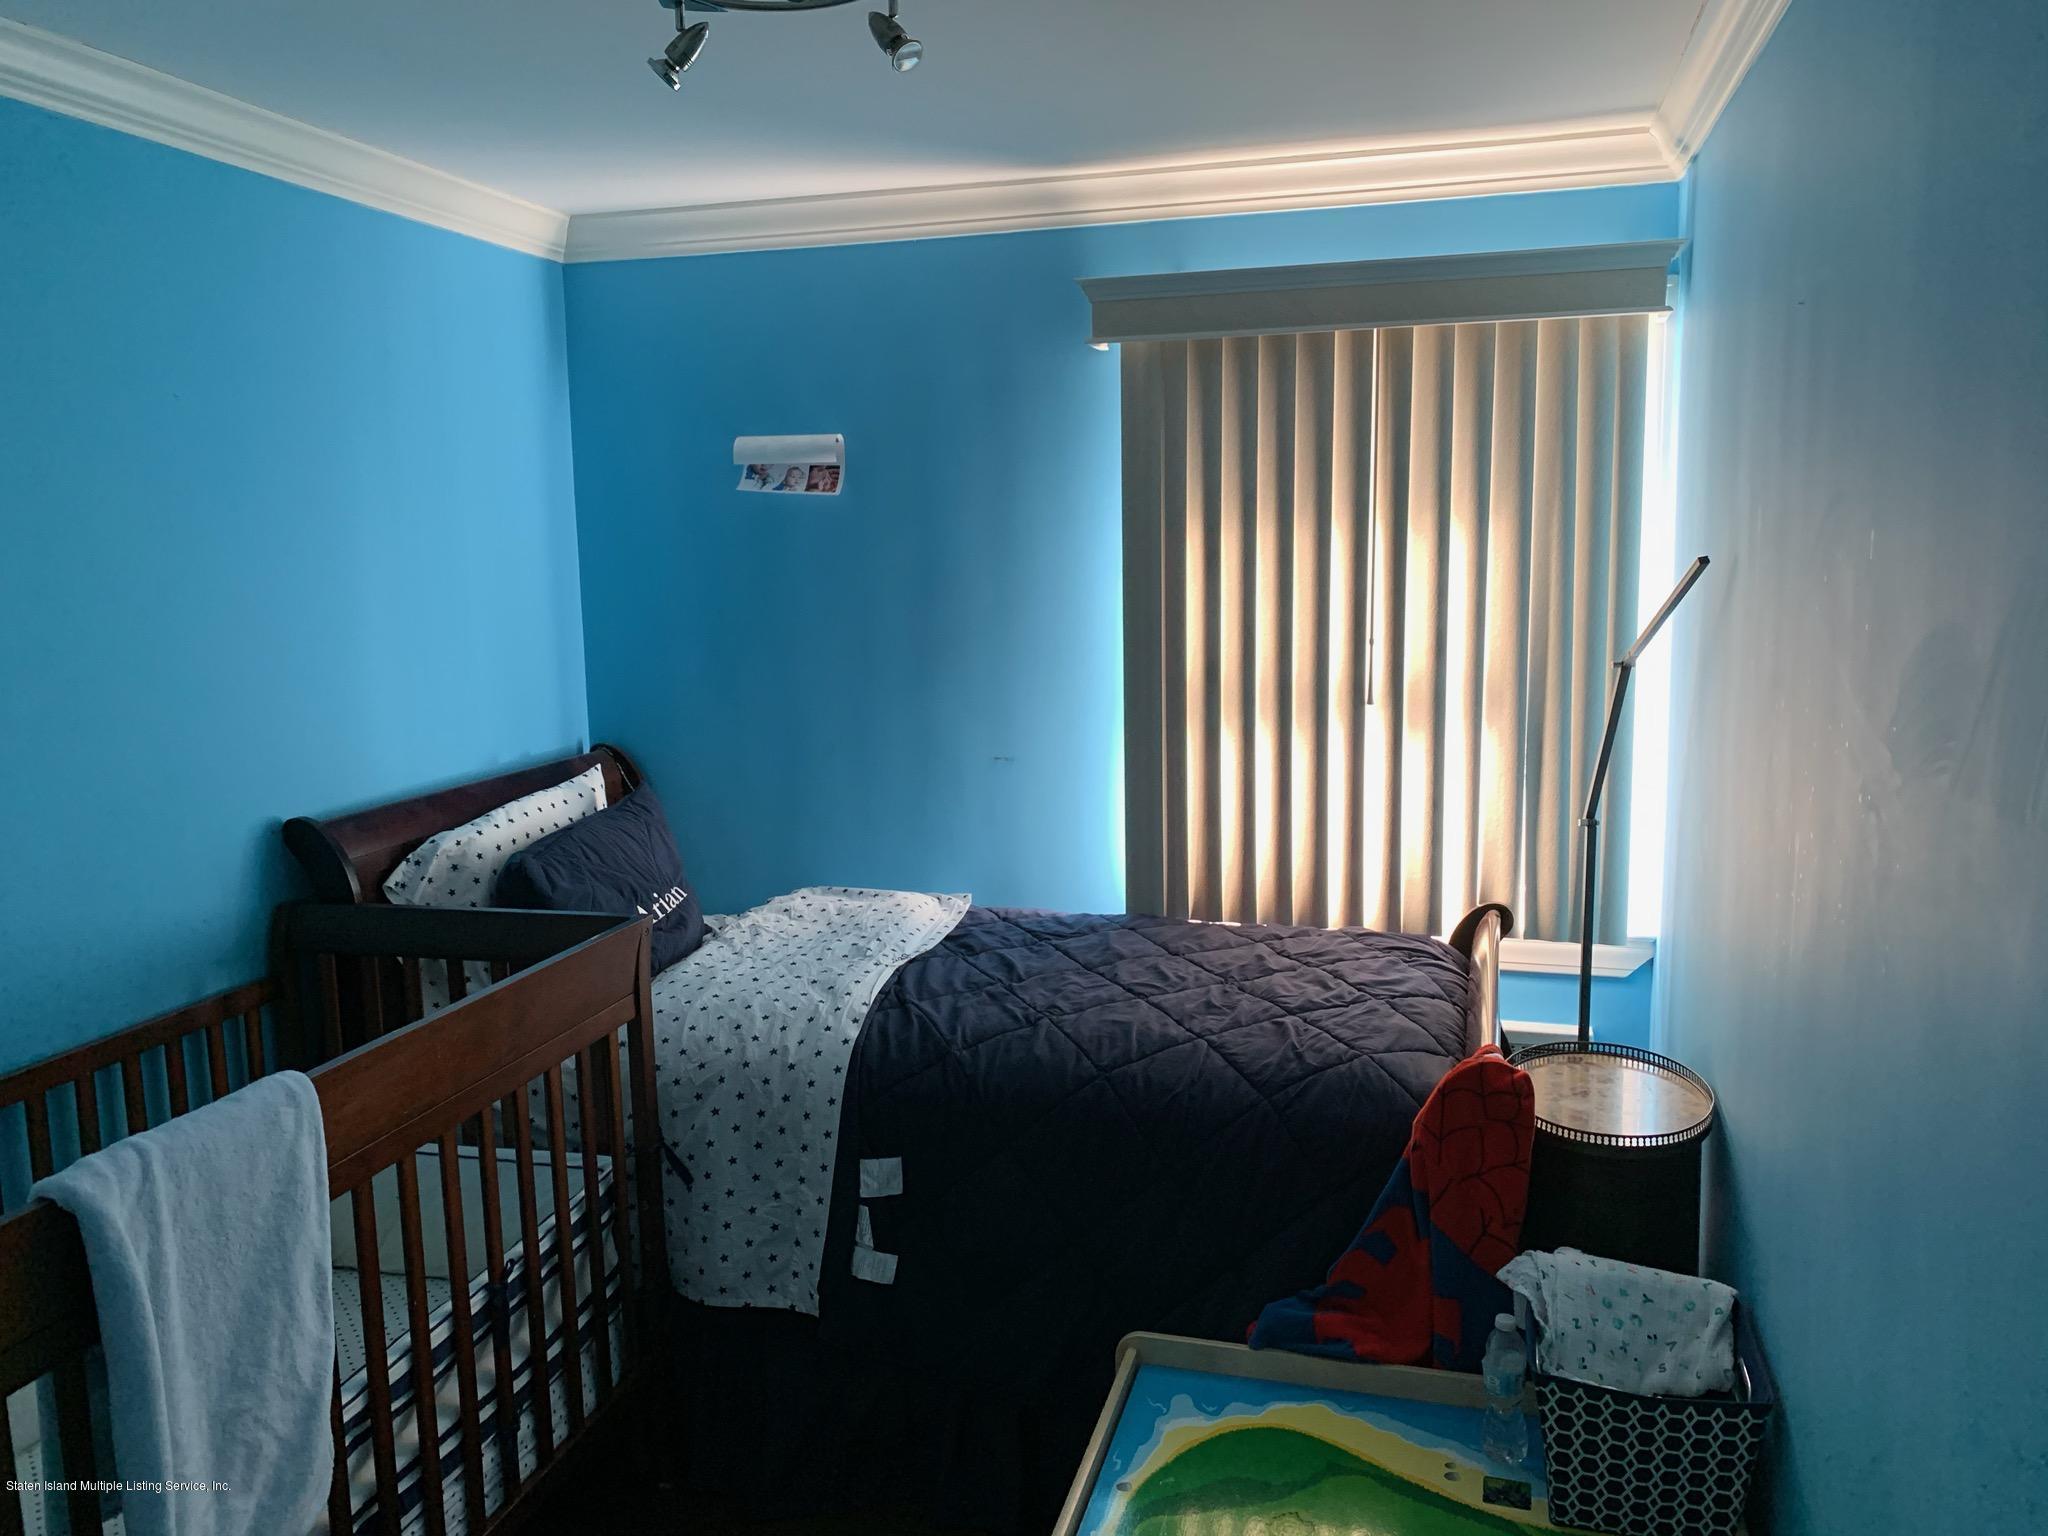 Single Family - Detached 58 Guyon Avenue  Staten Island, NY 10306, MLS-1135873-10